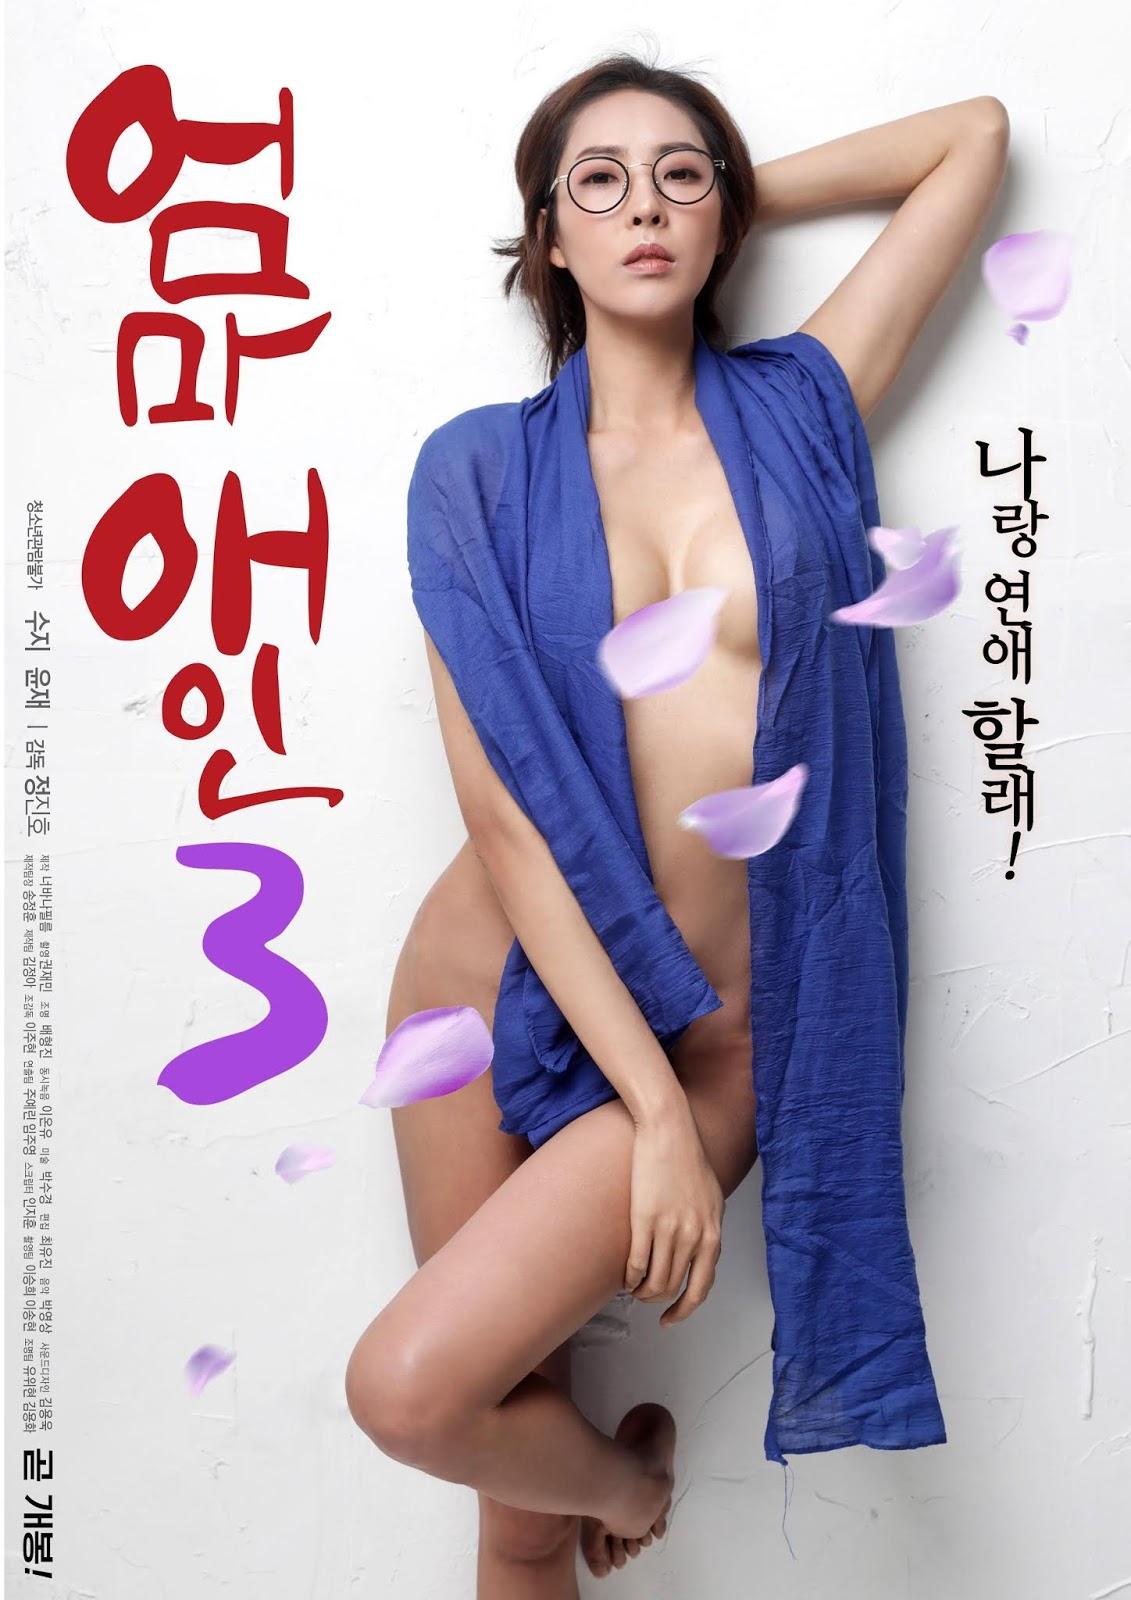 Mother's Lover 3 Full Korea 18+ Adult Movie Online Free